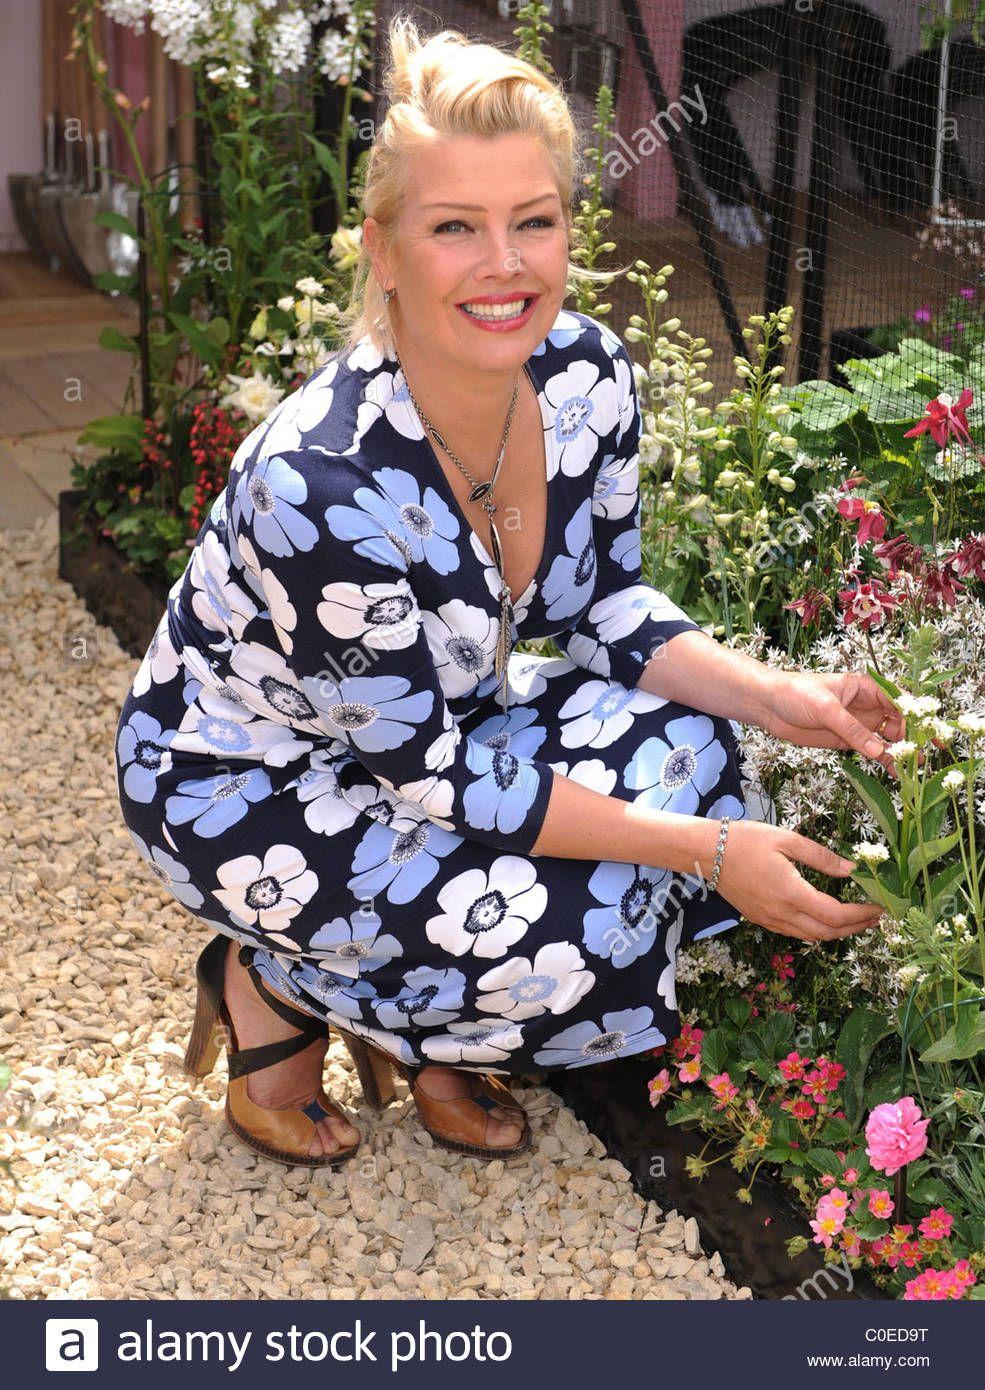 Stock Photo Kim Wilde at Chelsea Flower Show London